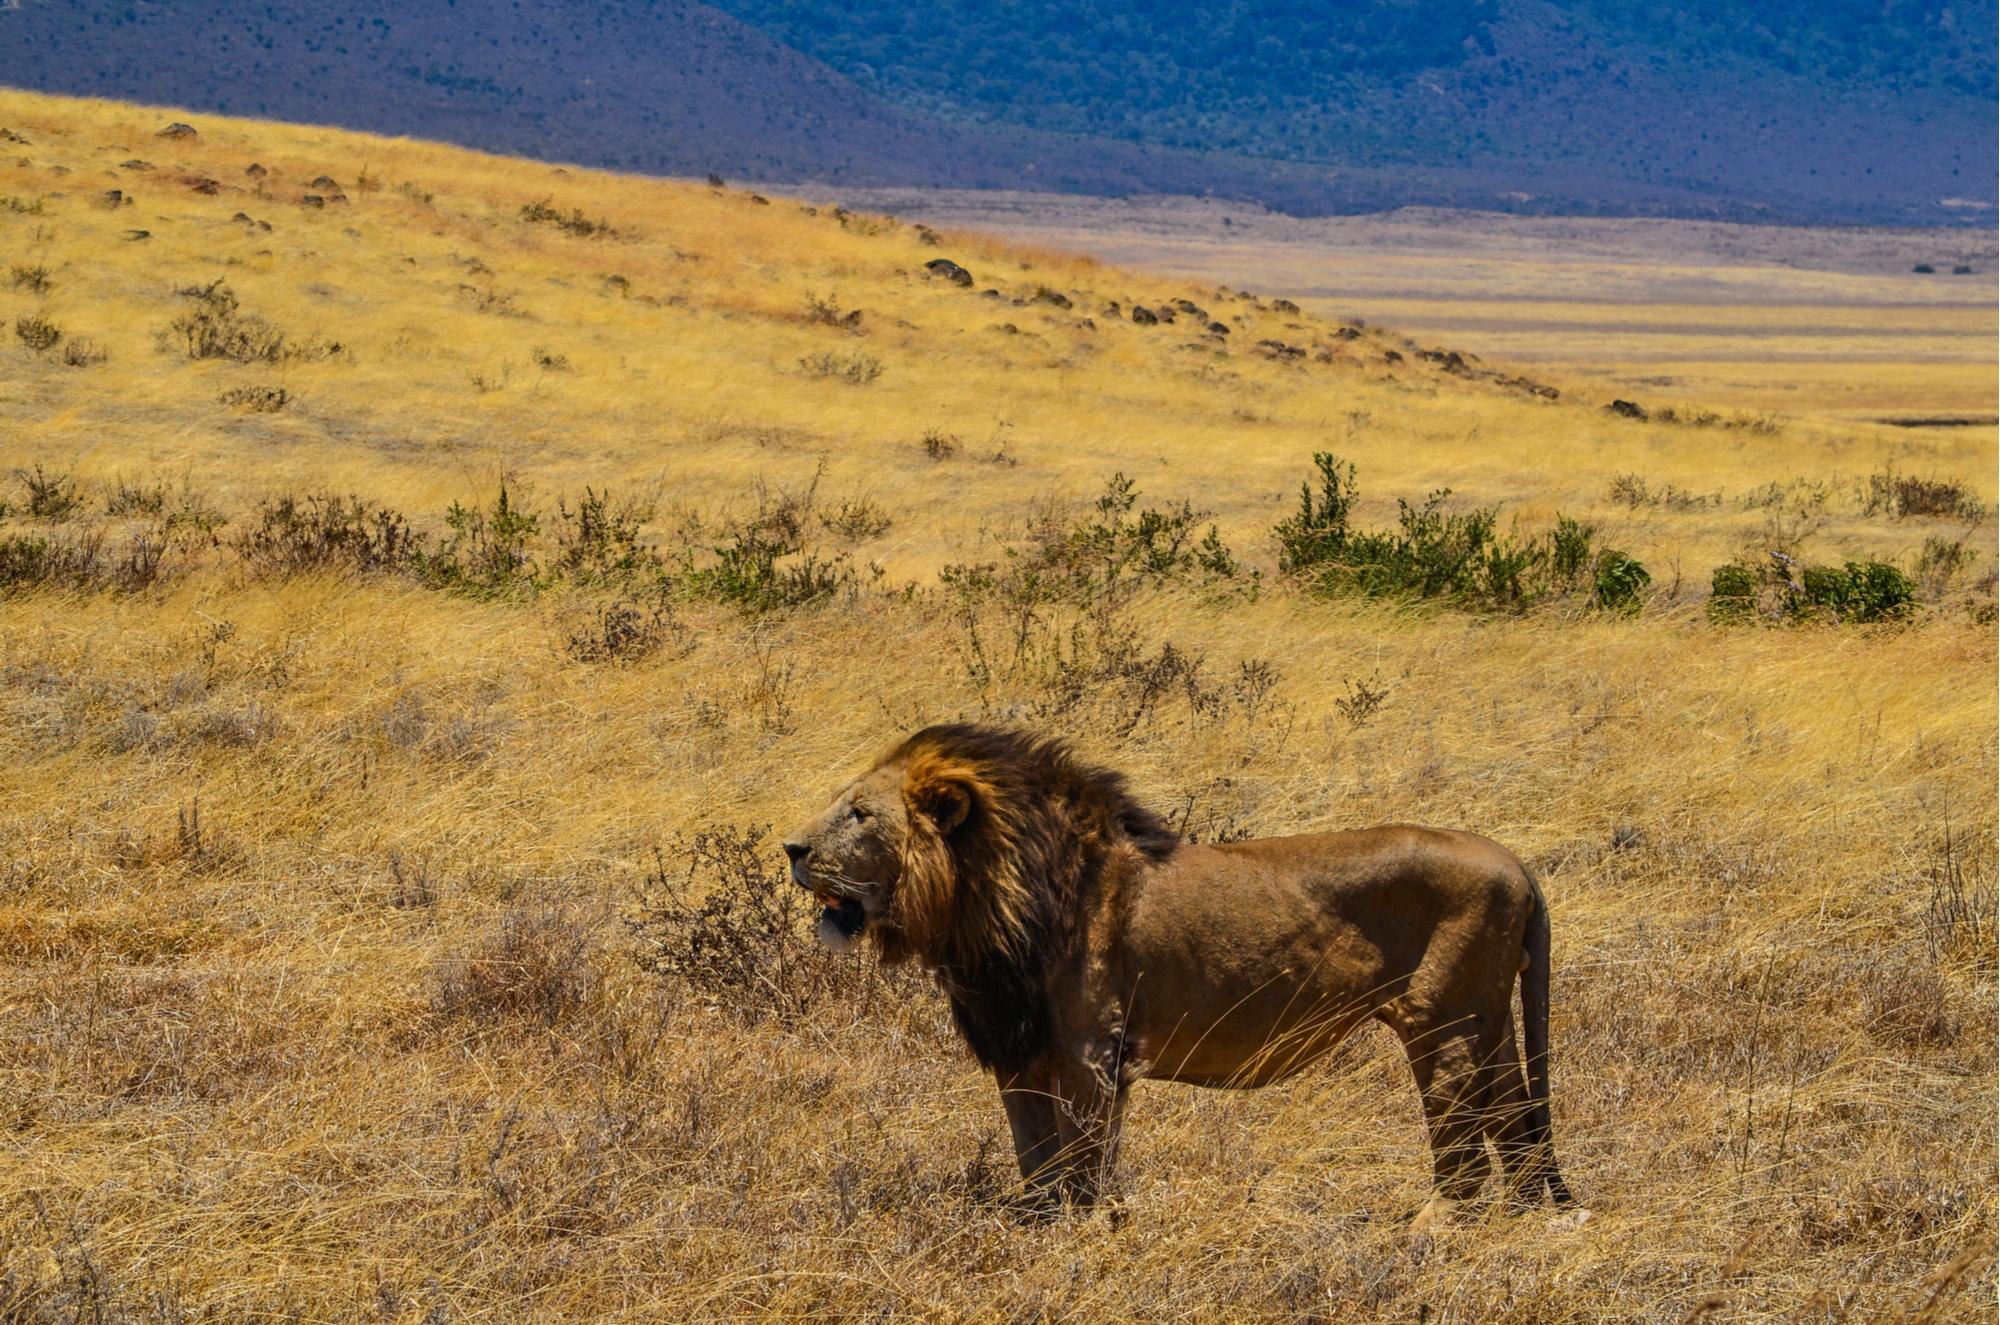 A lion encounter on the Walking Safari